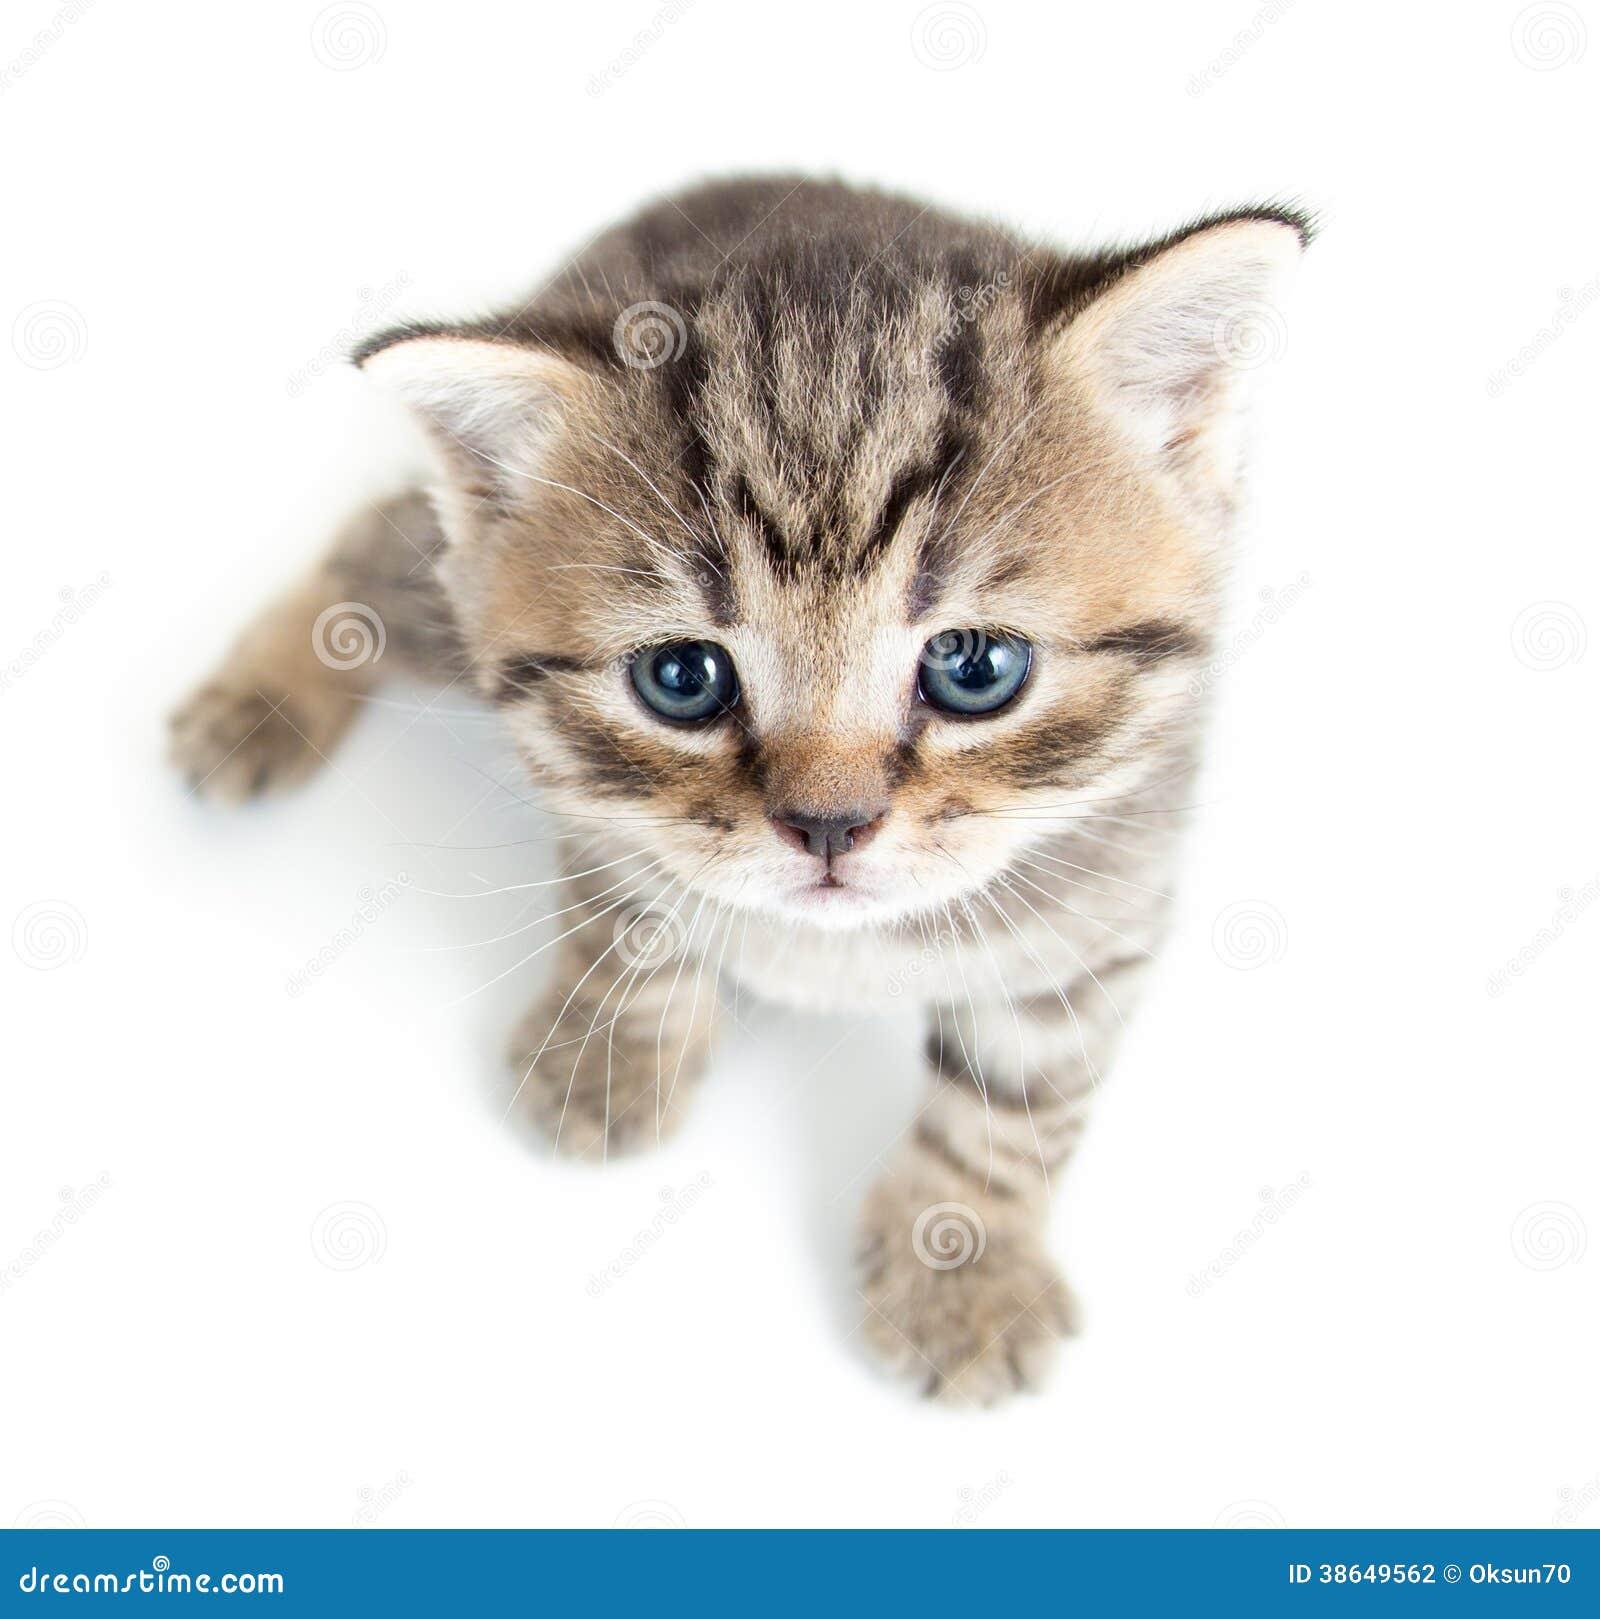 Top View Of Baby Cat Kitten Stock Photo Image Of Pedigree Beautiful 38649562